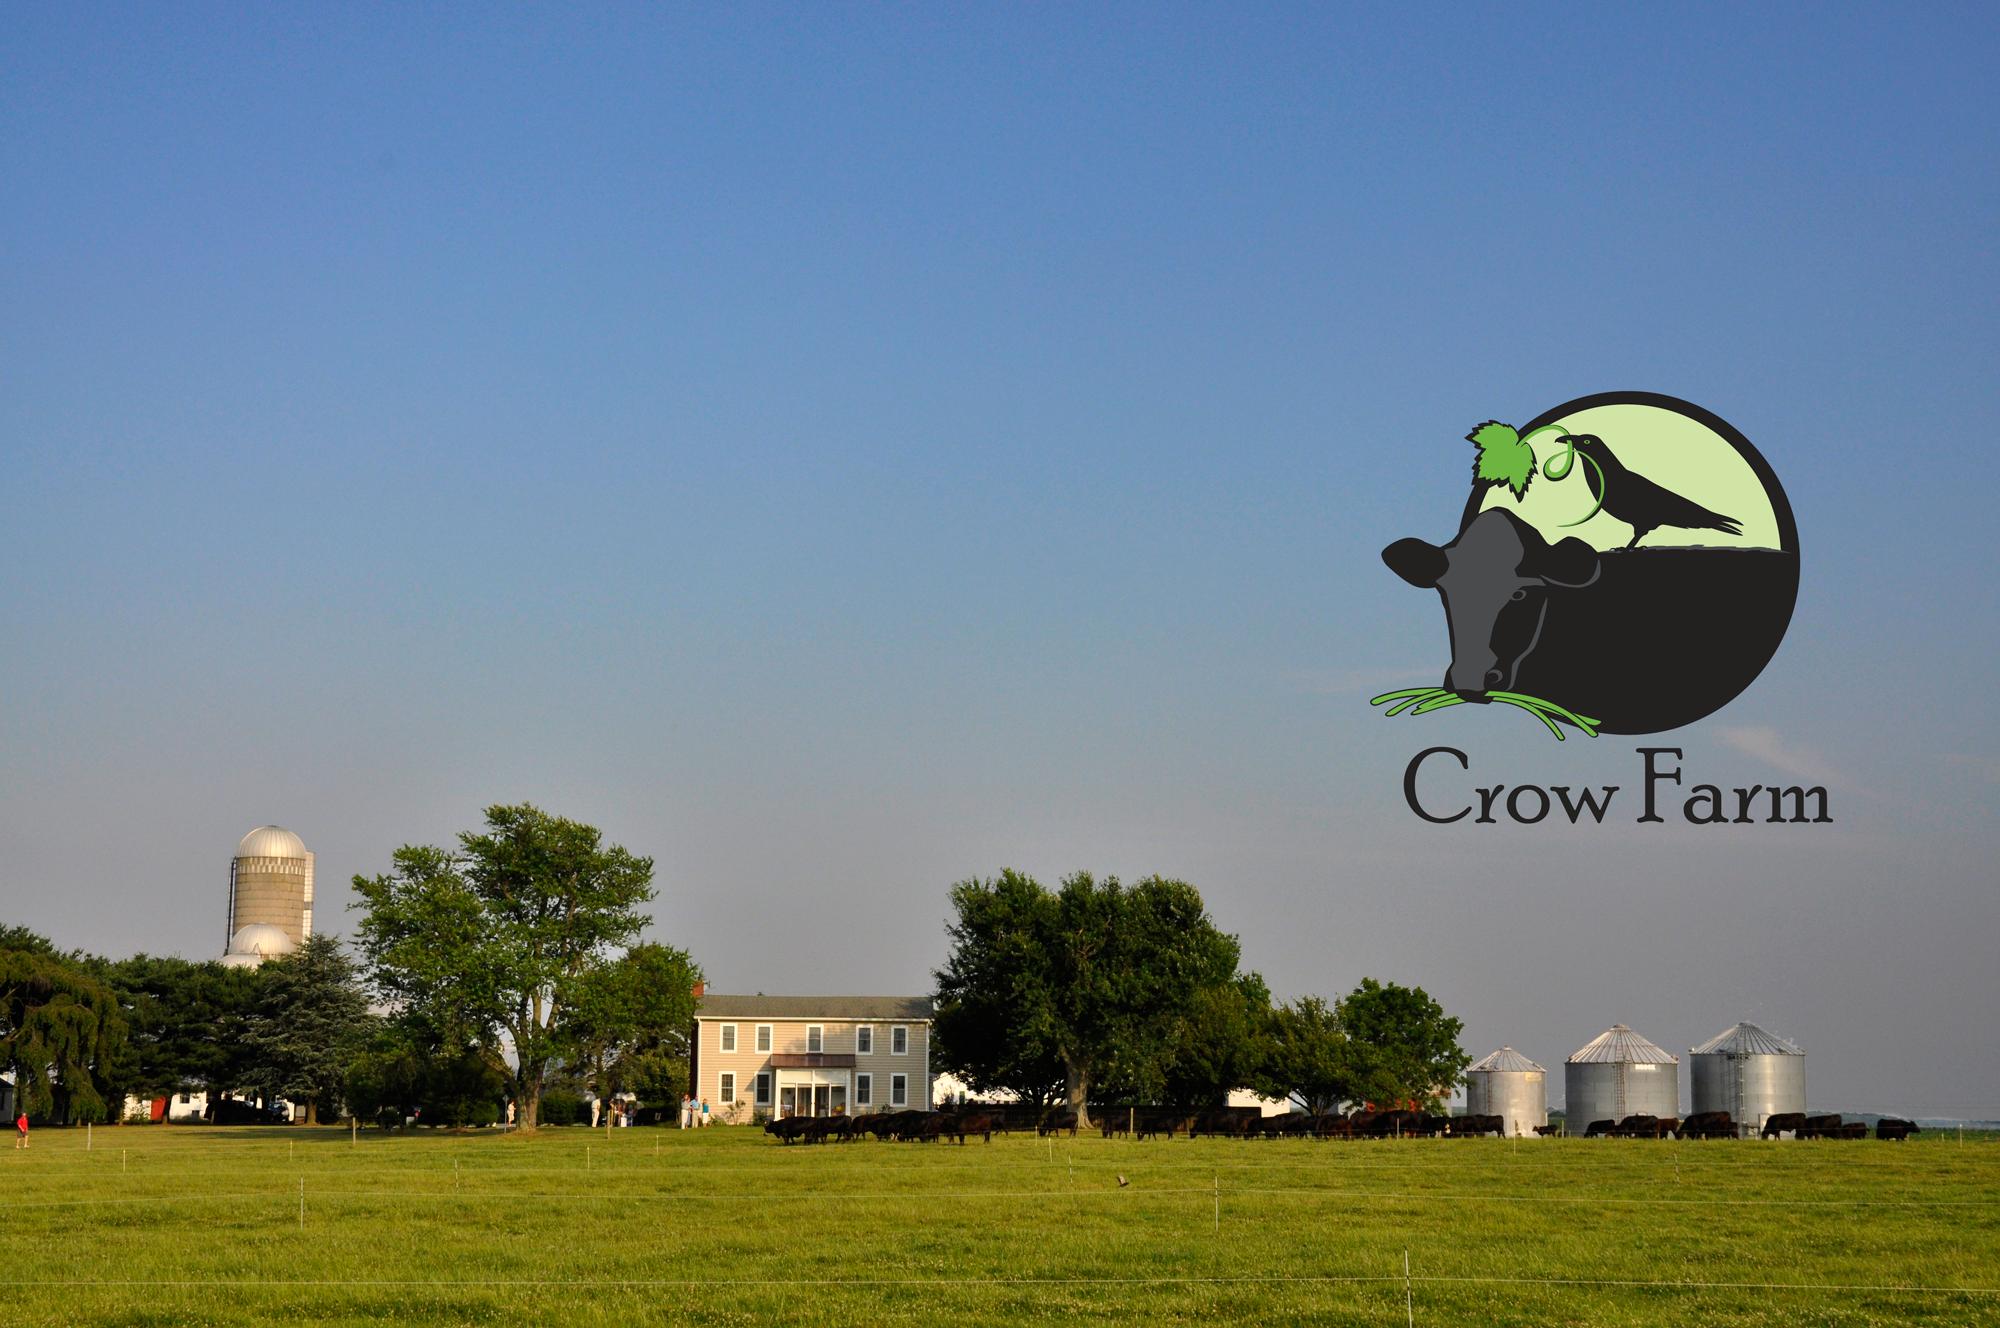 Crow Farm